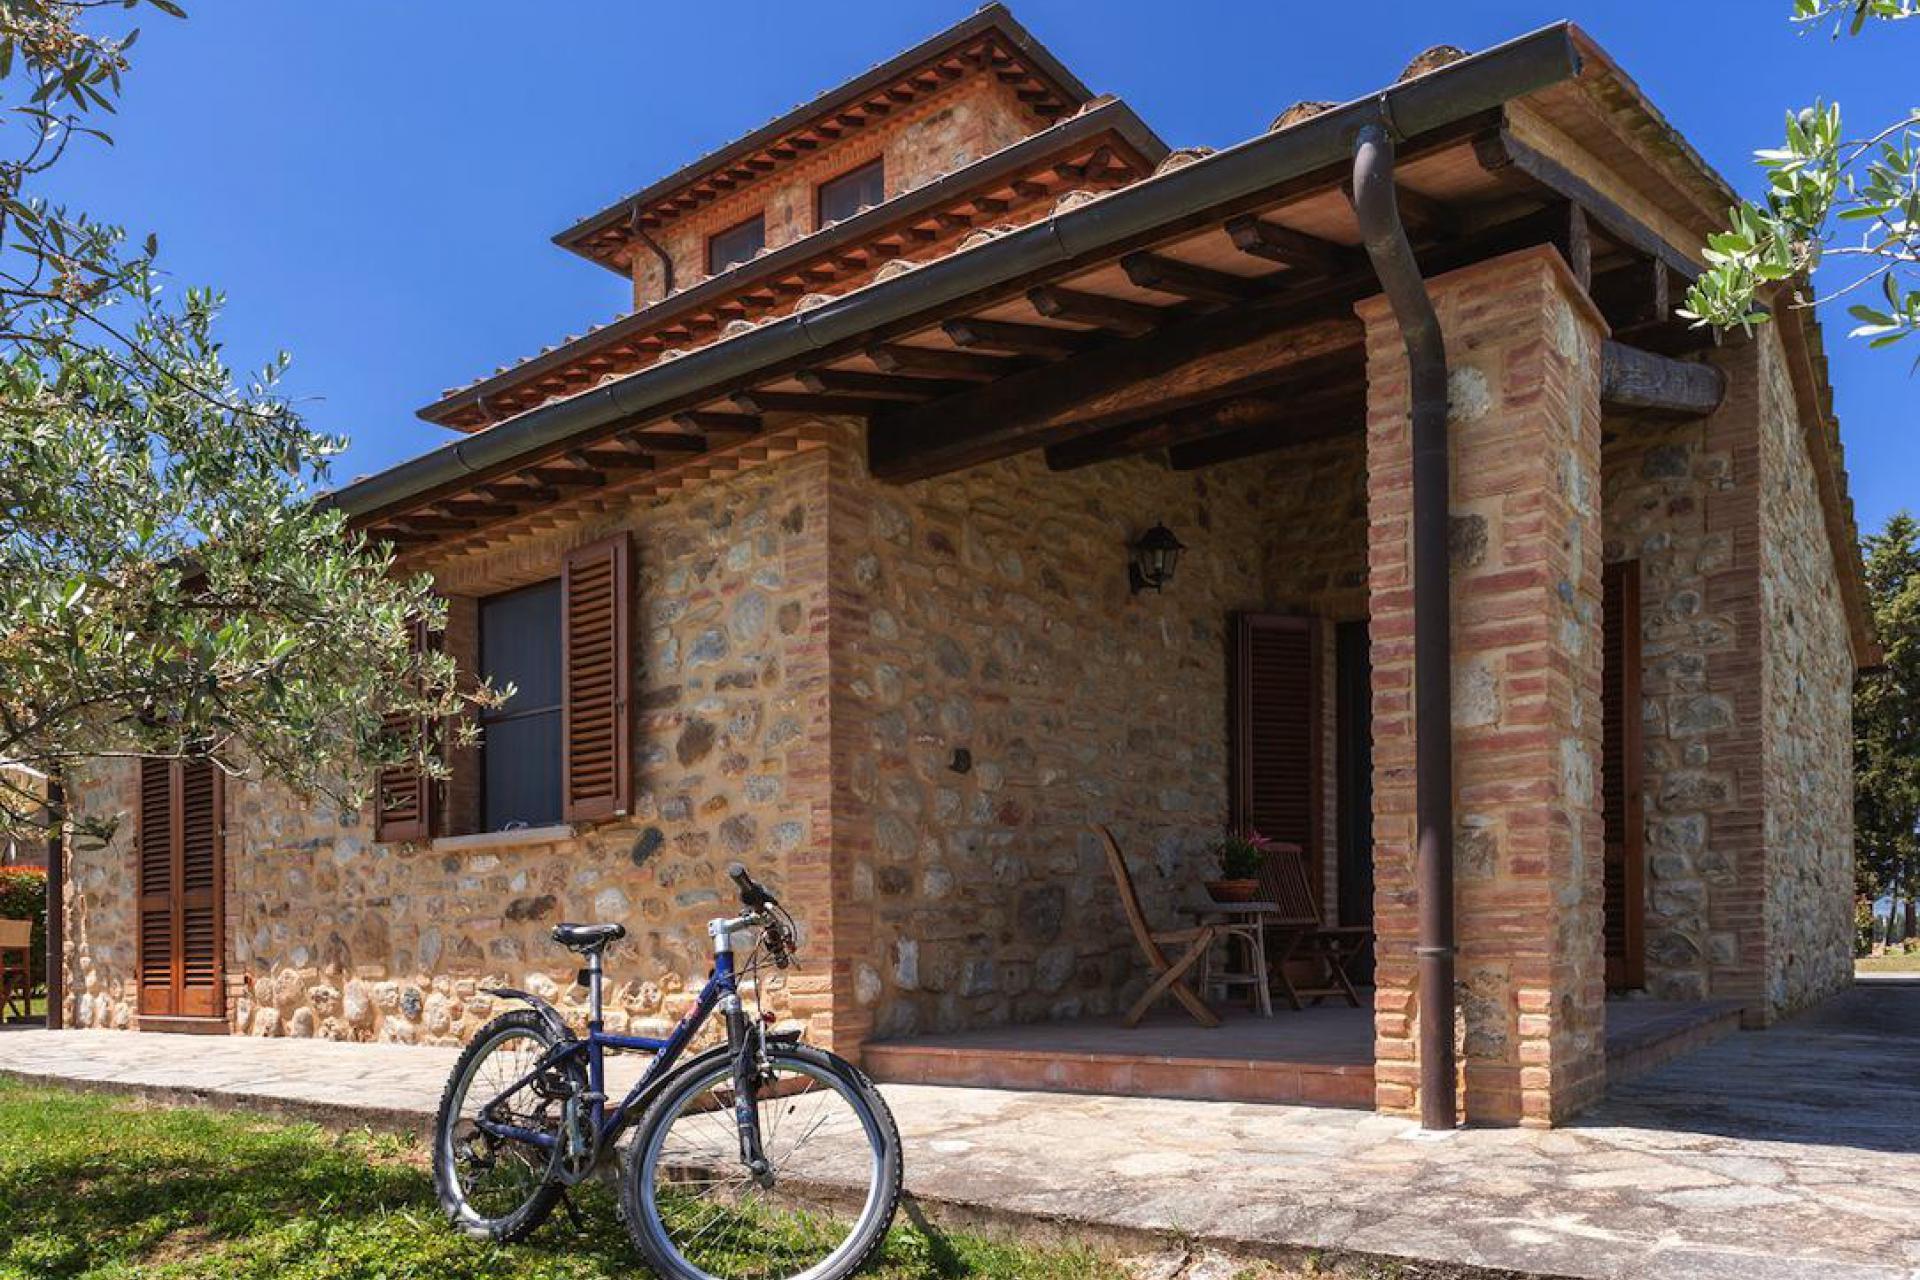 Agriturismo Toscane Kindvriendelijke agriturismo bij Volterra in Toscane | myitaly.nl